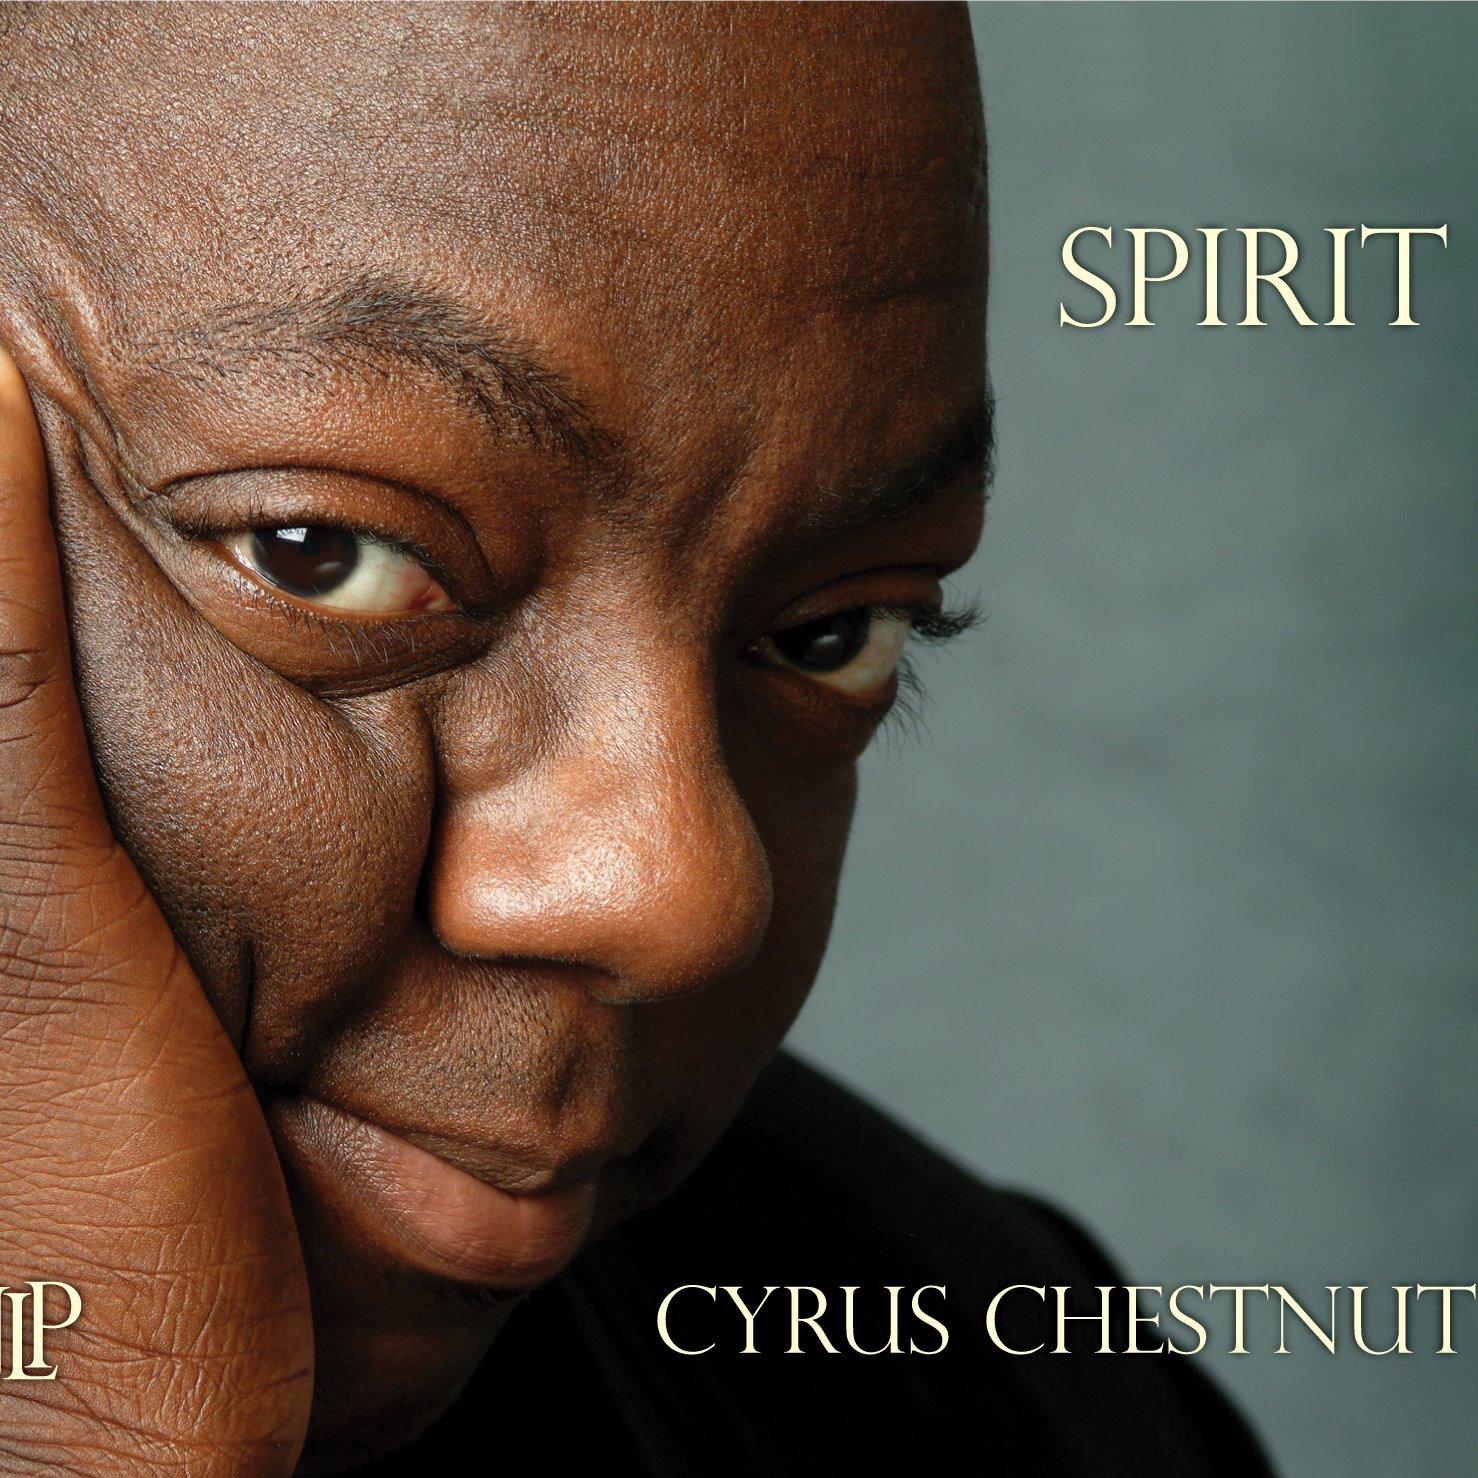 Jazz Legacy Productions SPIRIT Cyrus Chestnut Link Thumbnail | Linktree